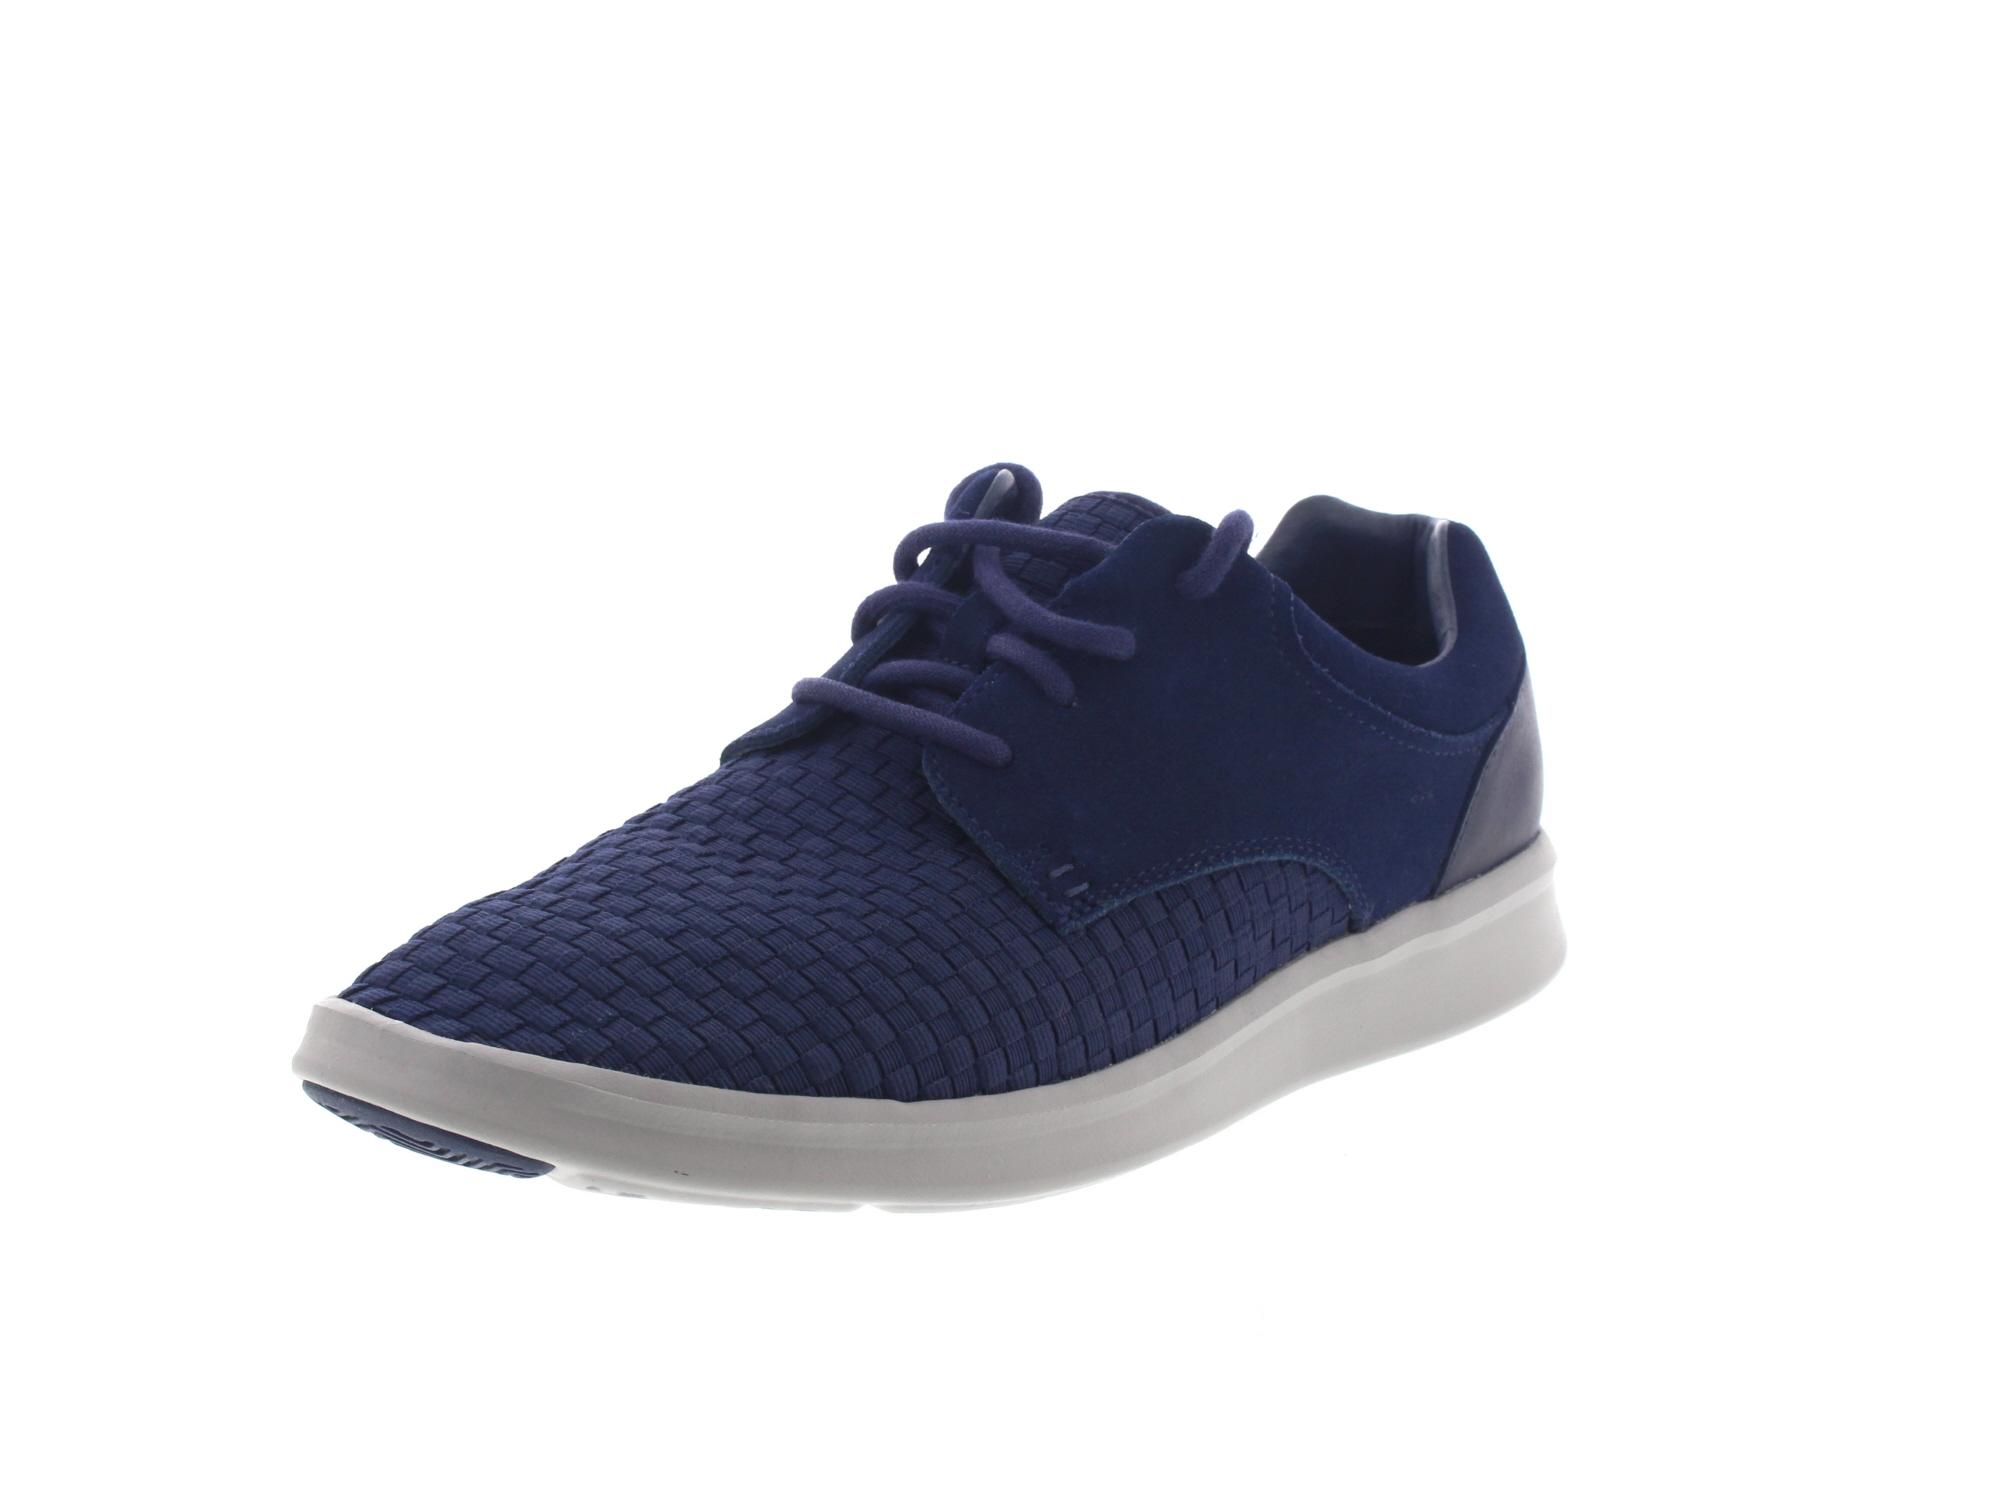 UGG Herrenschuhe - Sneaker HEPNER WOVEN - new navy-0